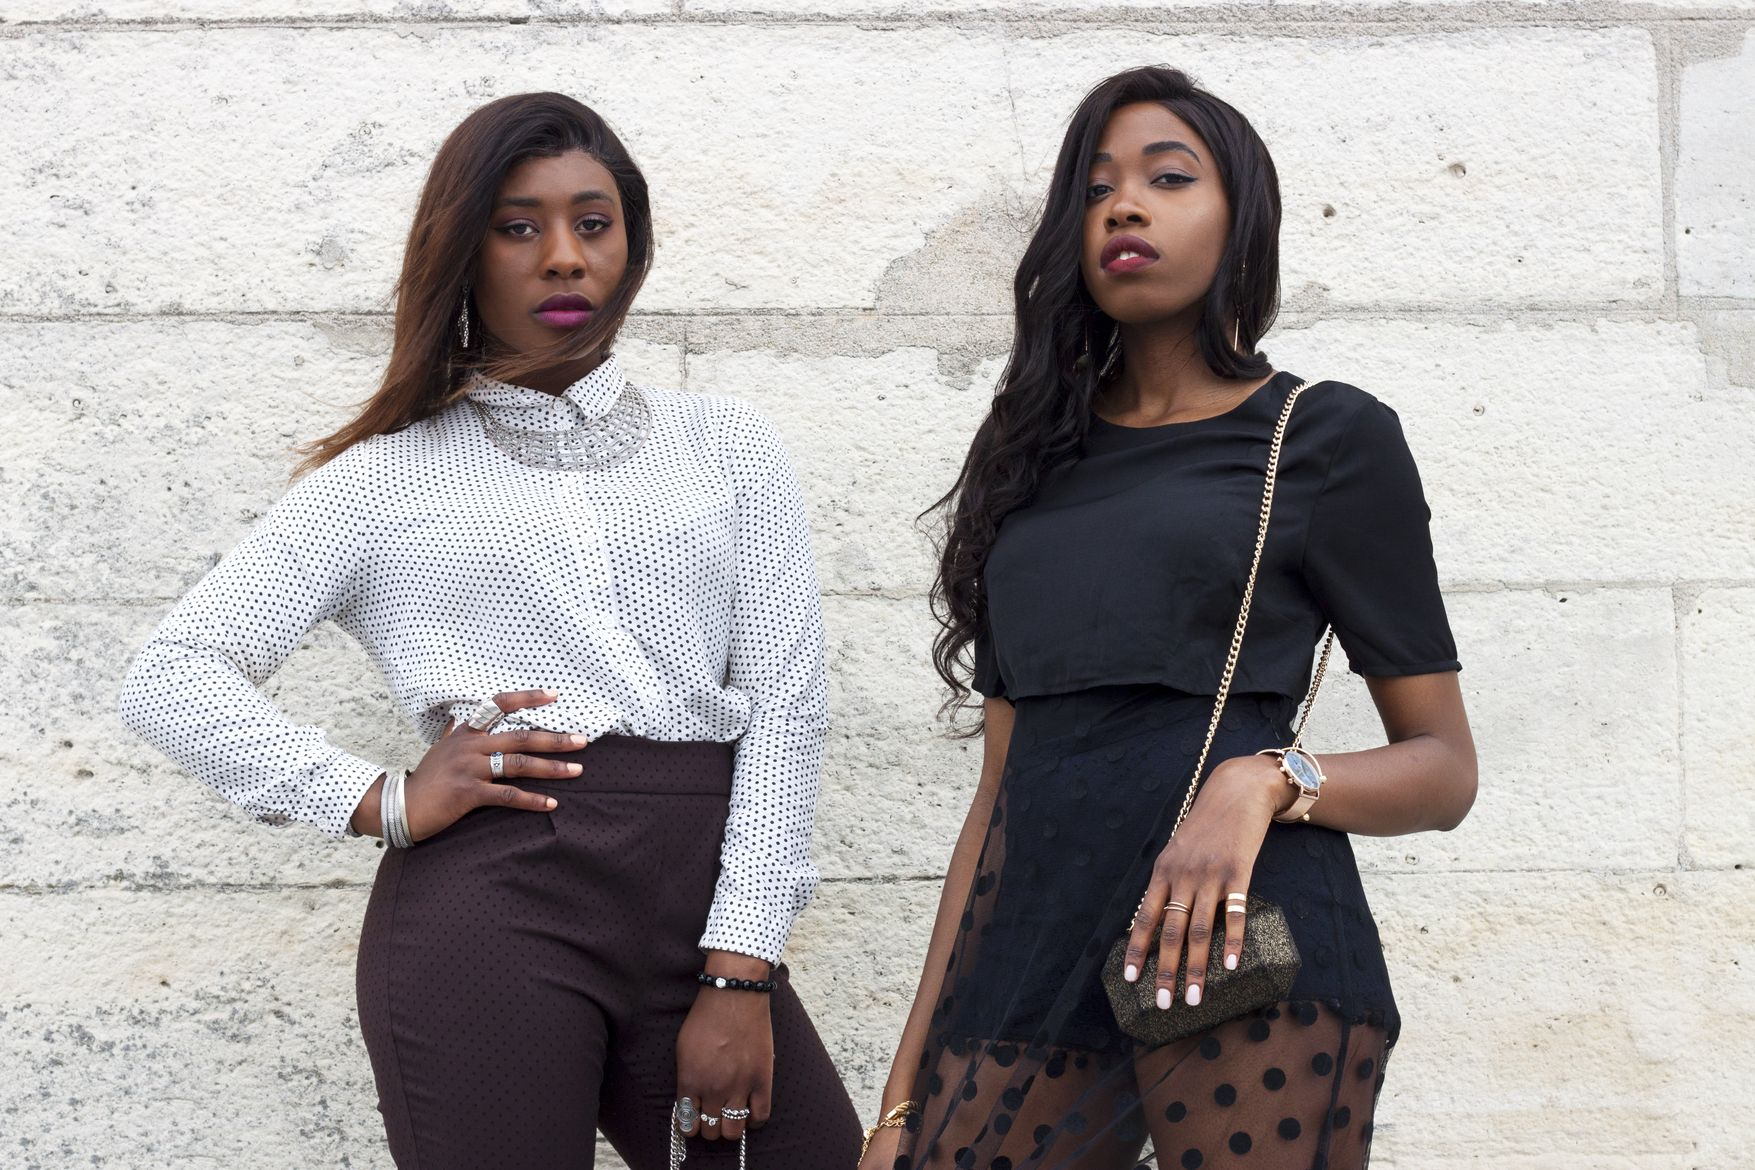 Golden Connexion : fashion focus : slay wearing polka dot